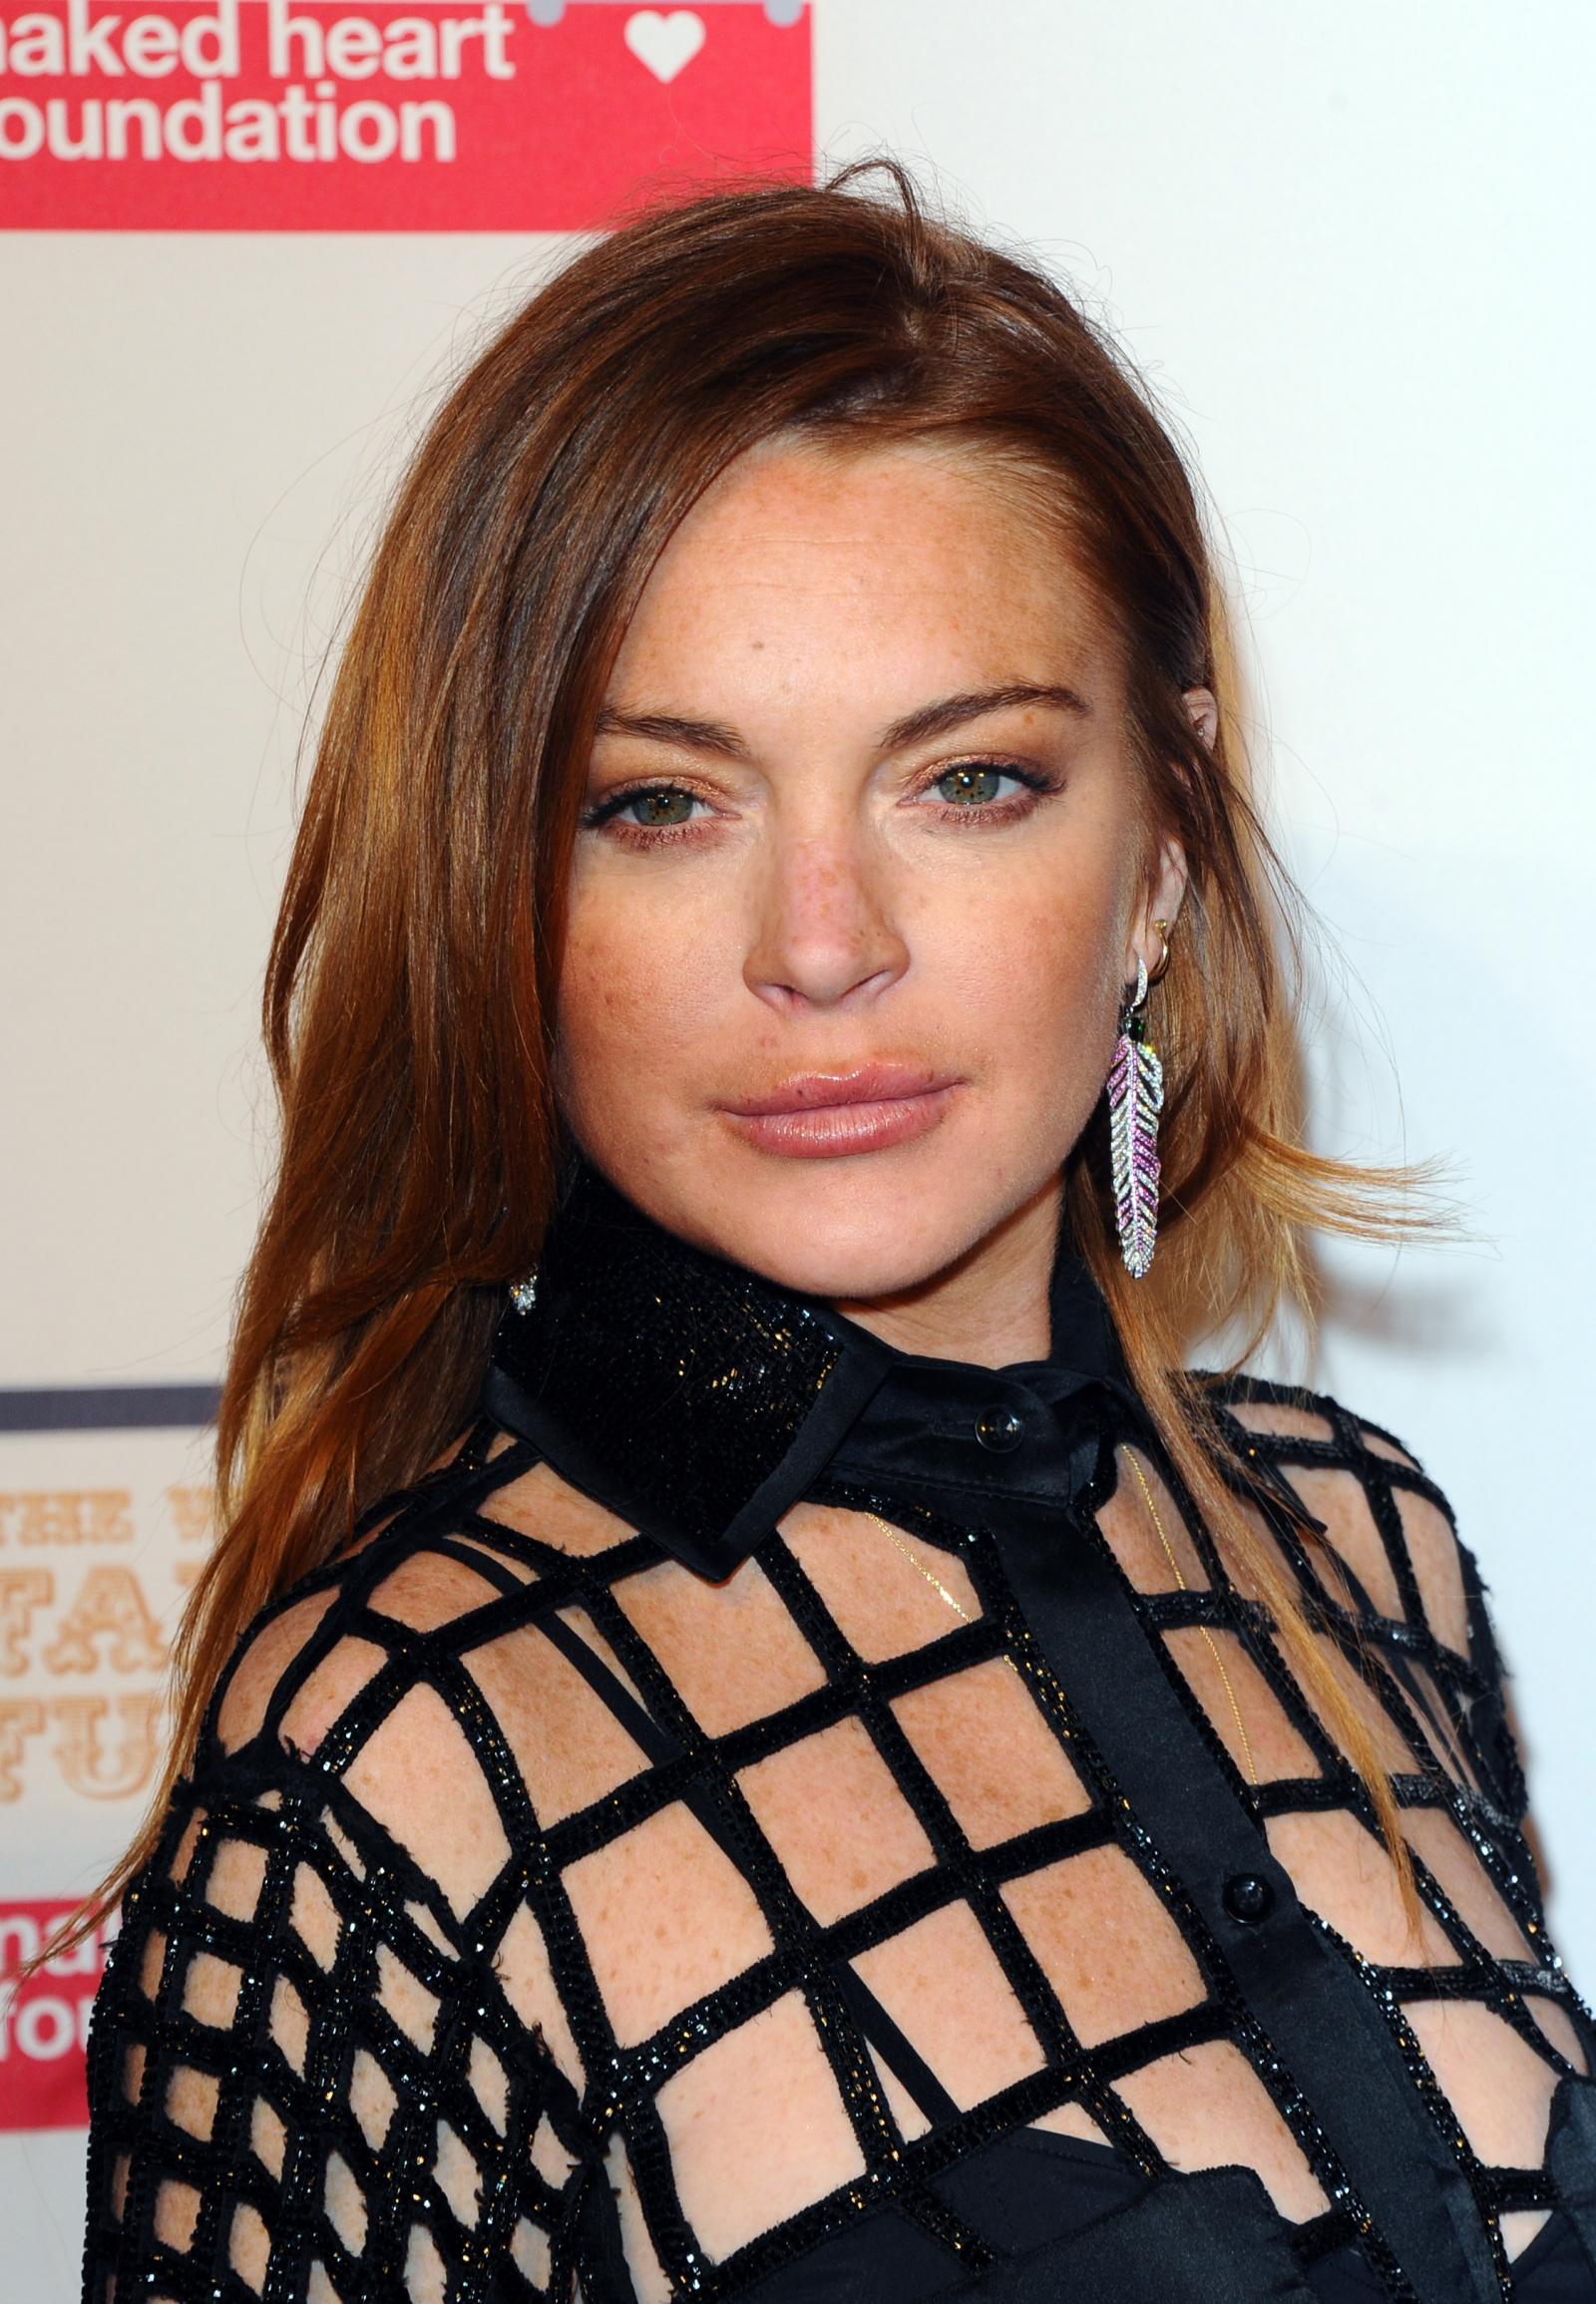 Lindsay Lohan and Egor Tarabasov